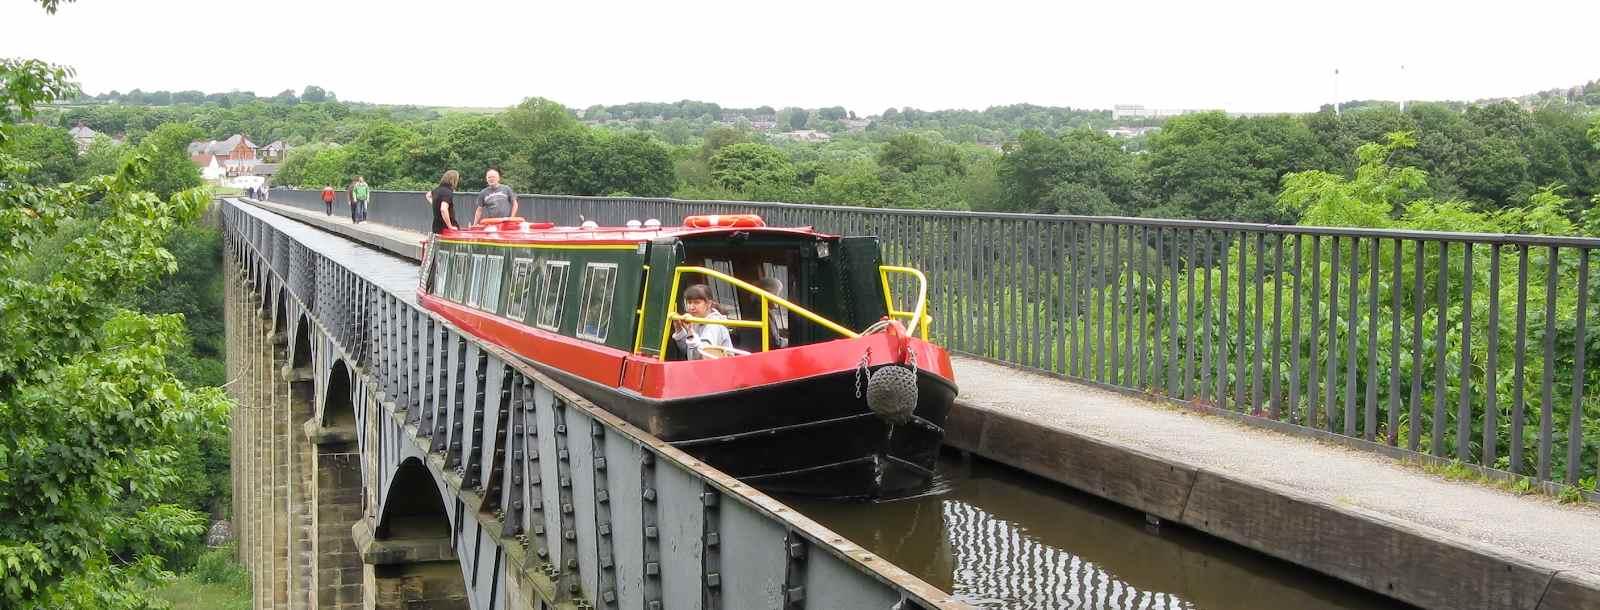 Narrowboat Route Llangollen Canal